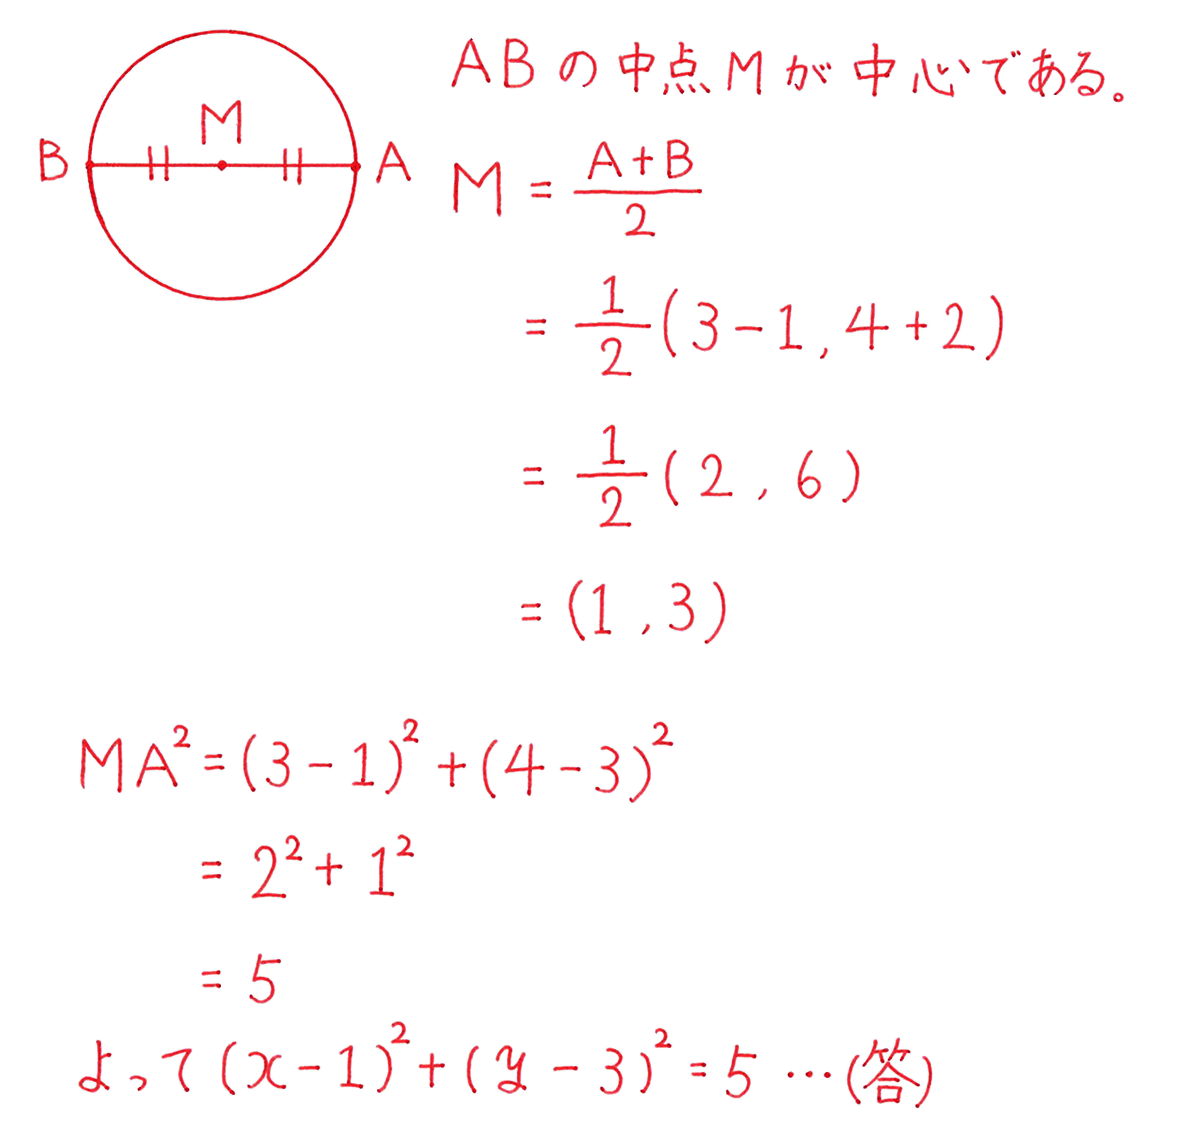 高校数学Ⅱ 図形と方程式15 練習 答え